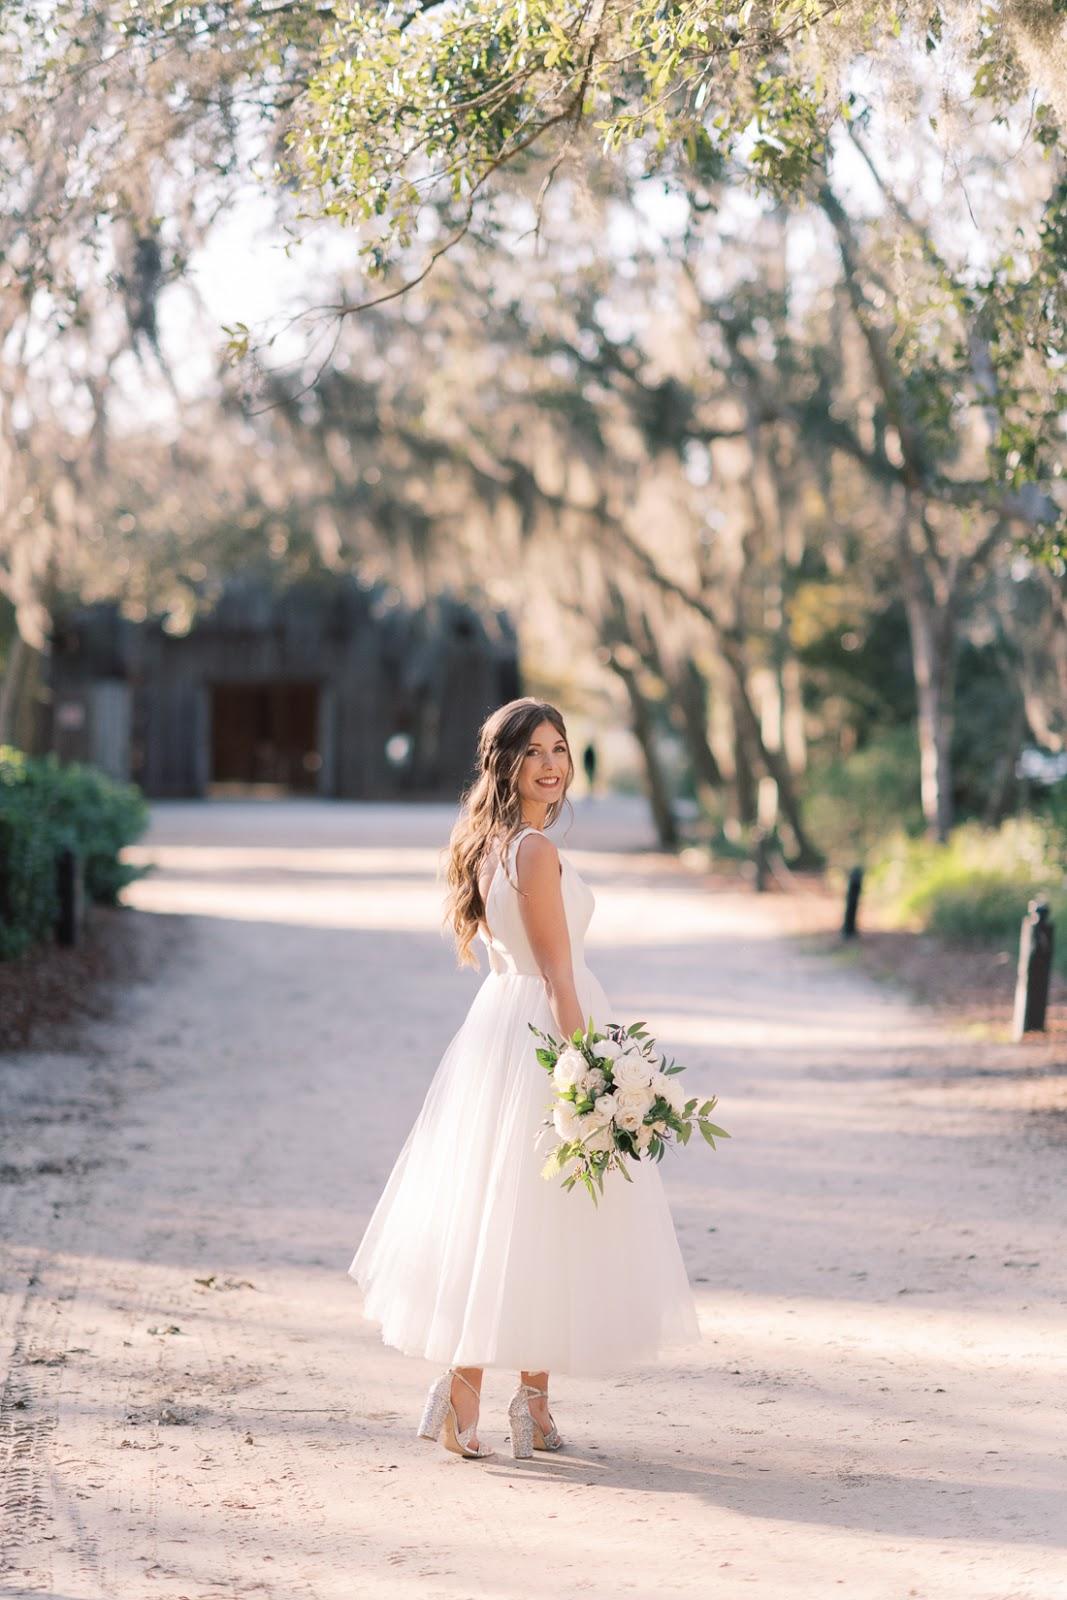 Reception Wedding Dress - Chasing Cinderella